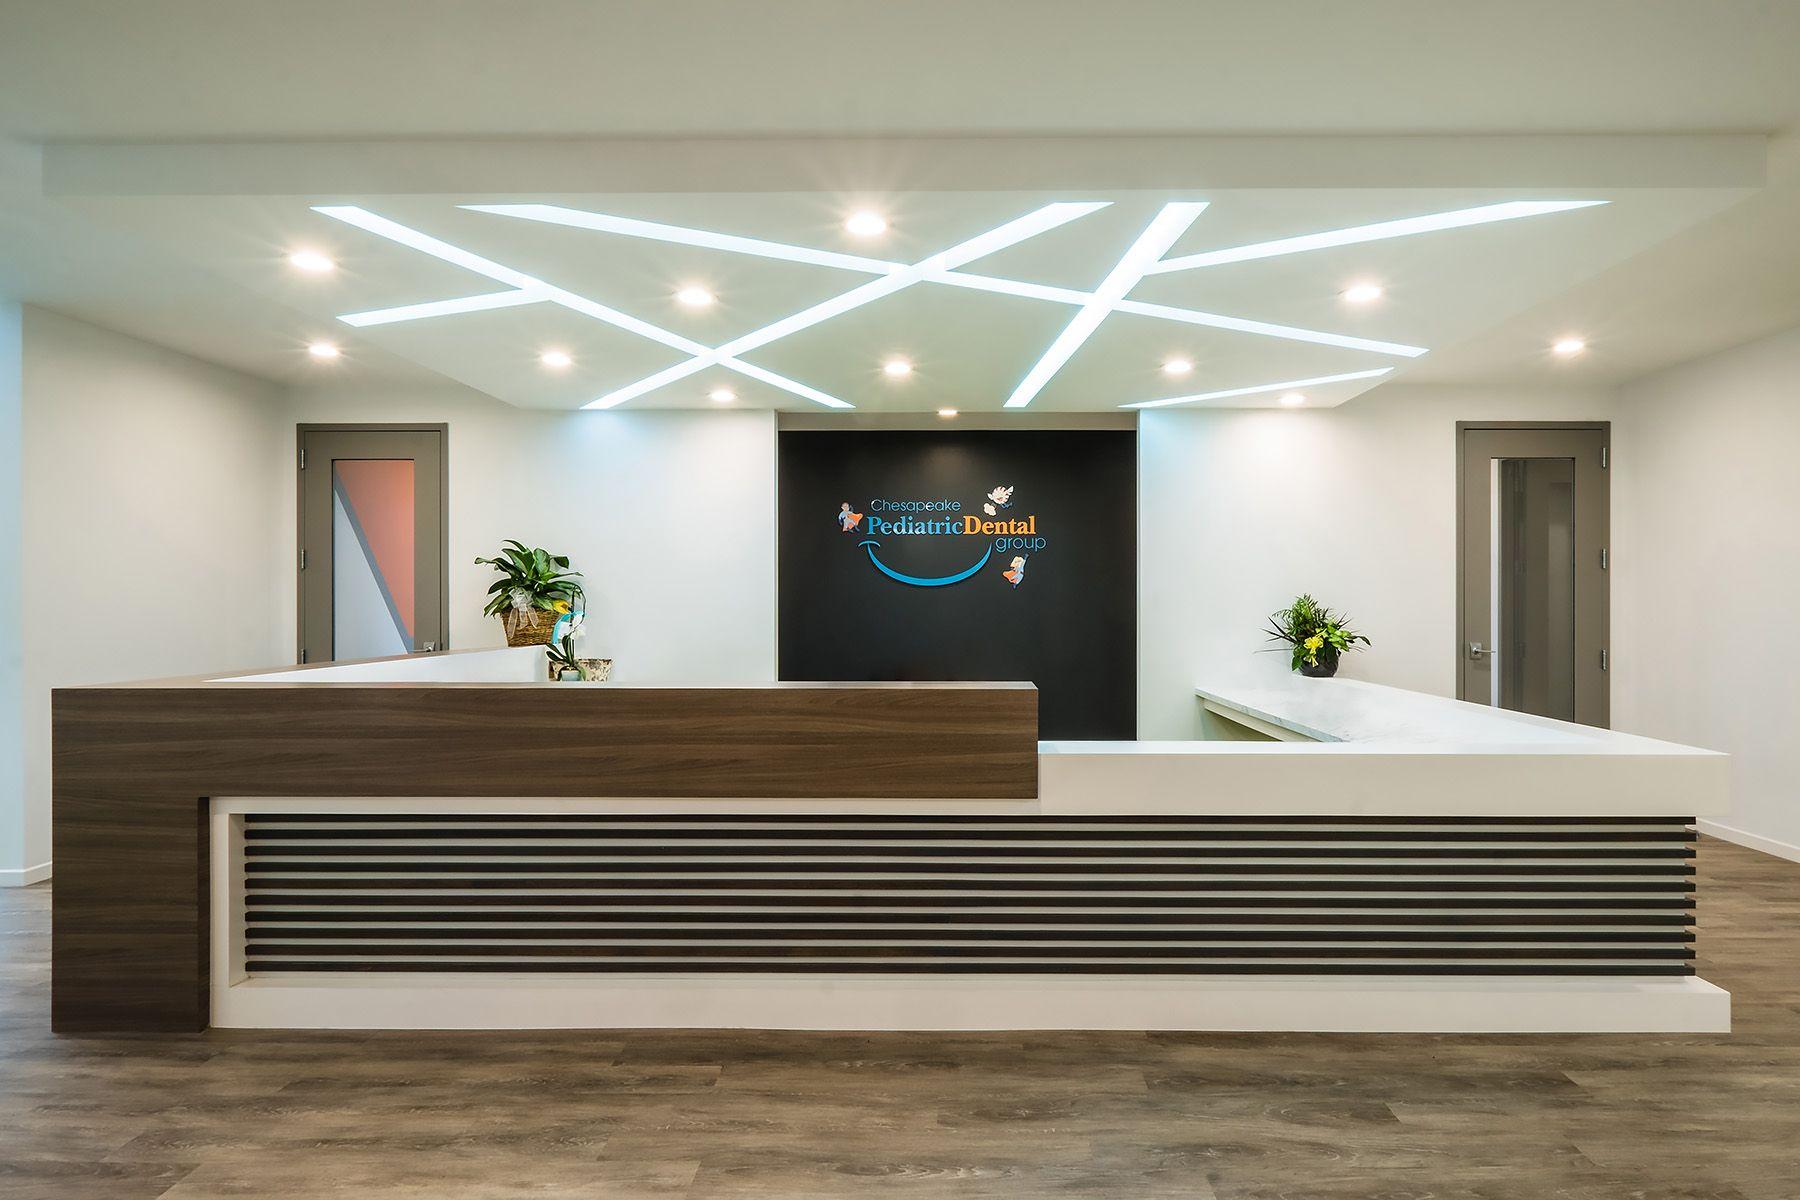 Chesapeake Pediatric Dental Medical Office Design Interior